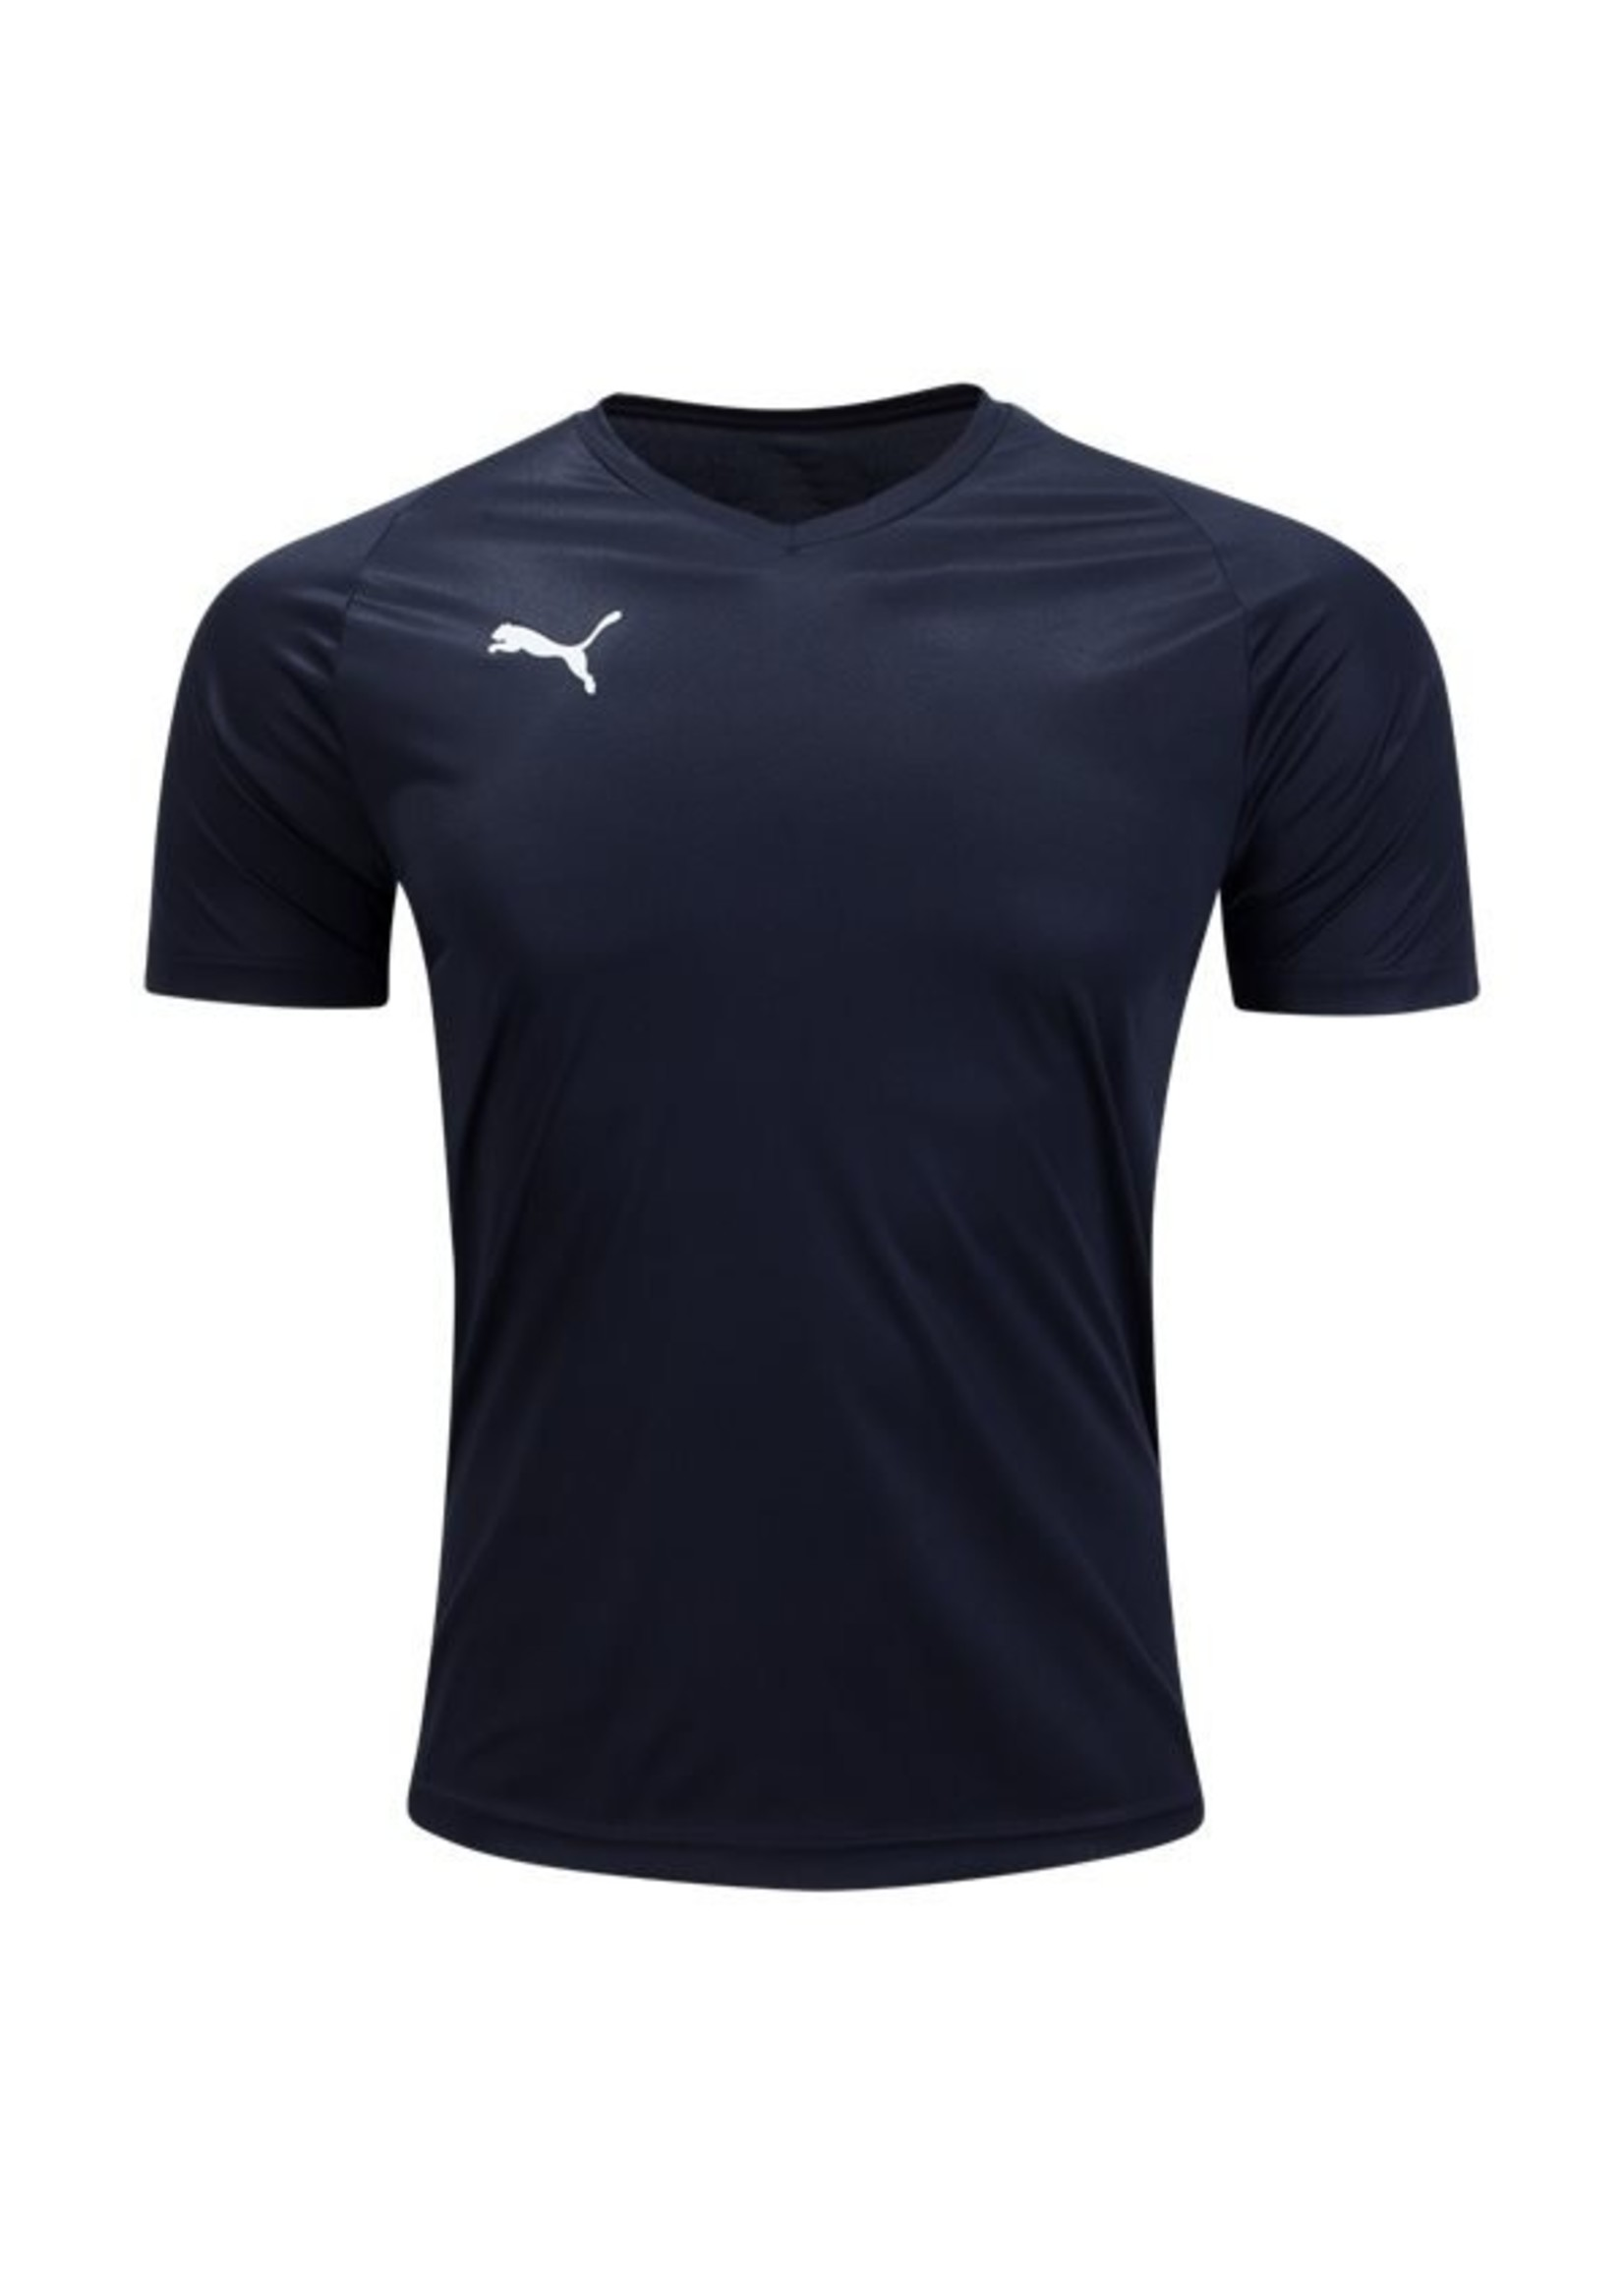 Puma Liga Core Jersey - Black Adult